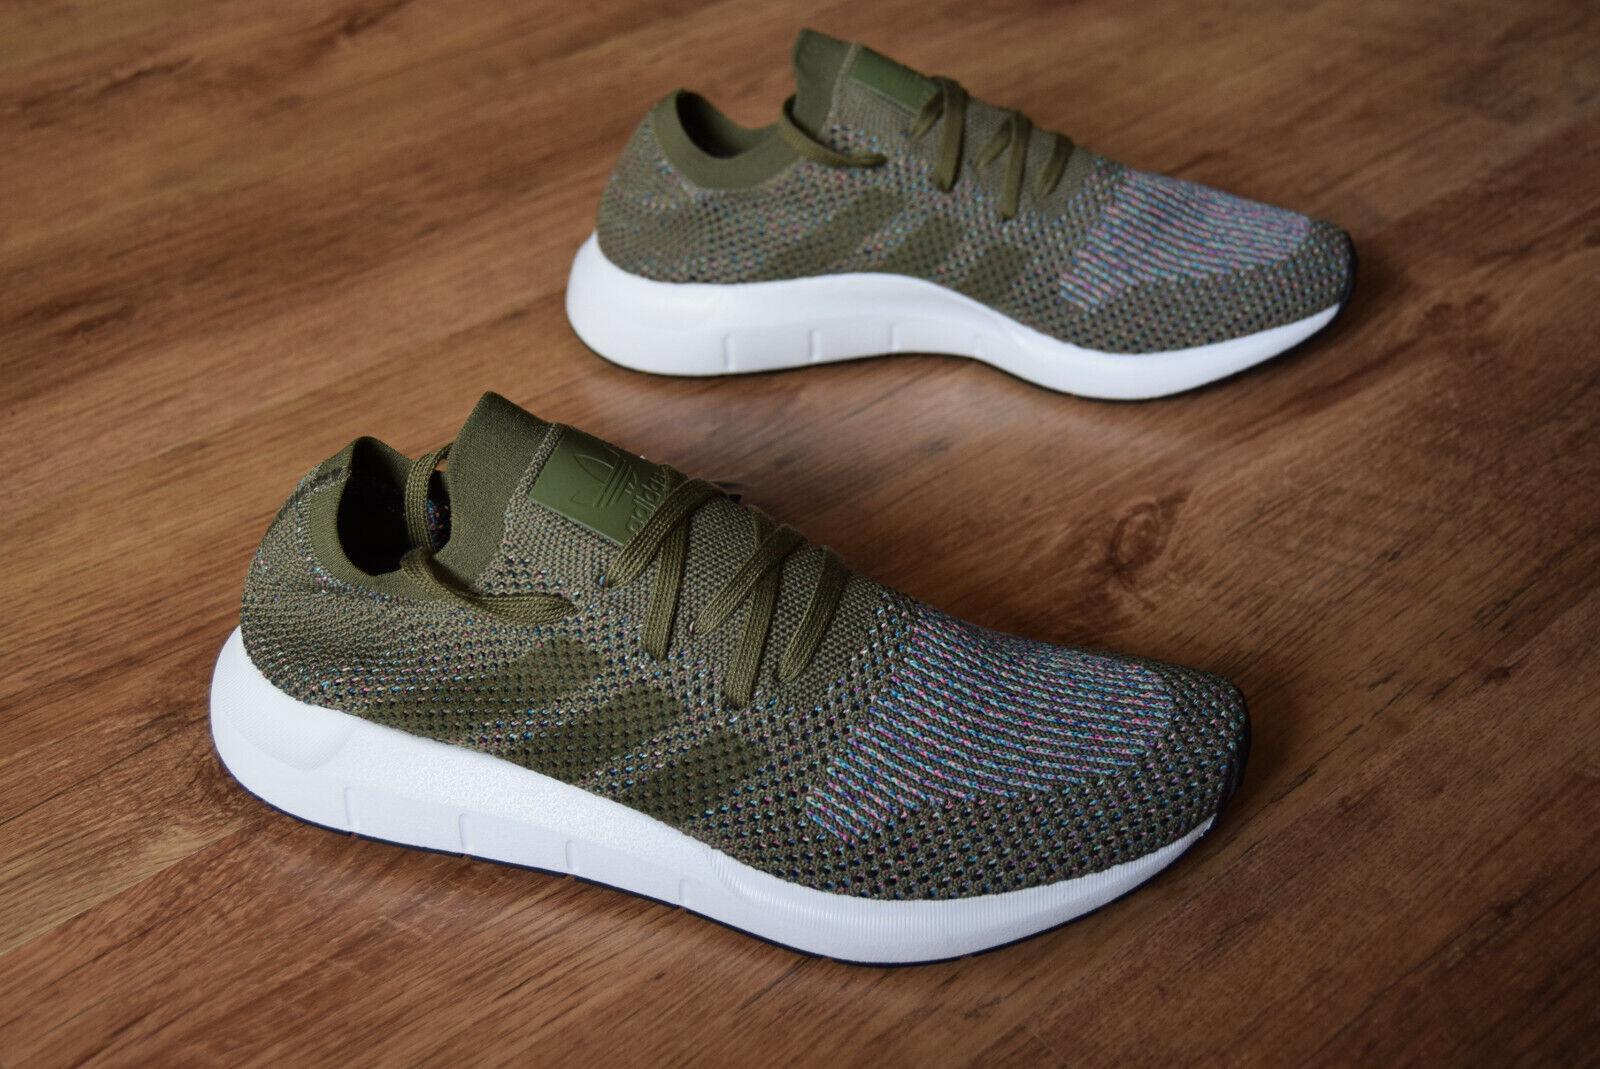 Adidas Swift Run PK 40,5 42 43 44,5 46 BB6811  ultra boost nmd r1 iniki